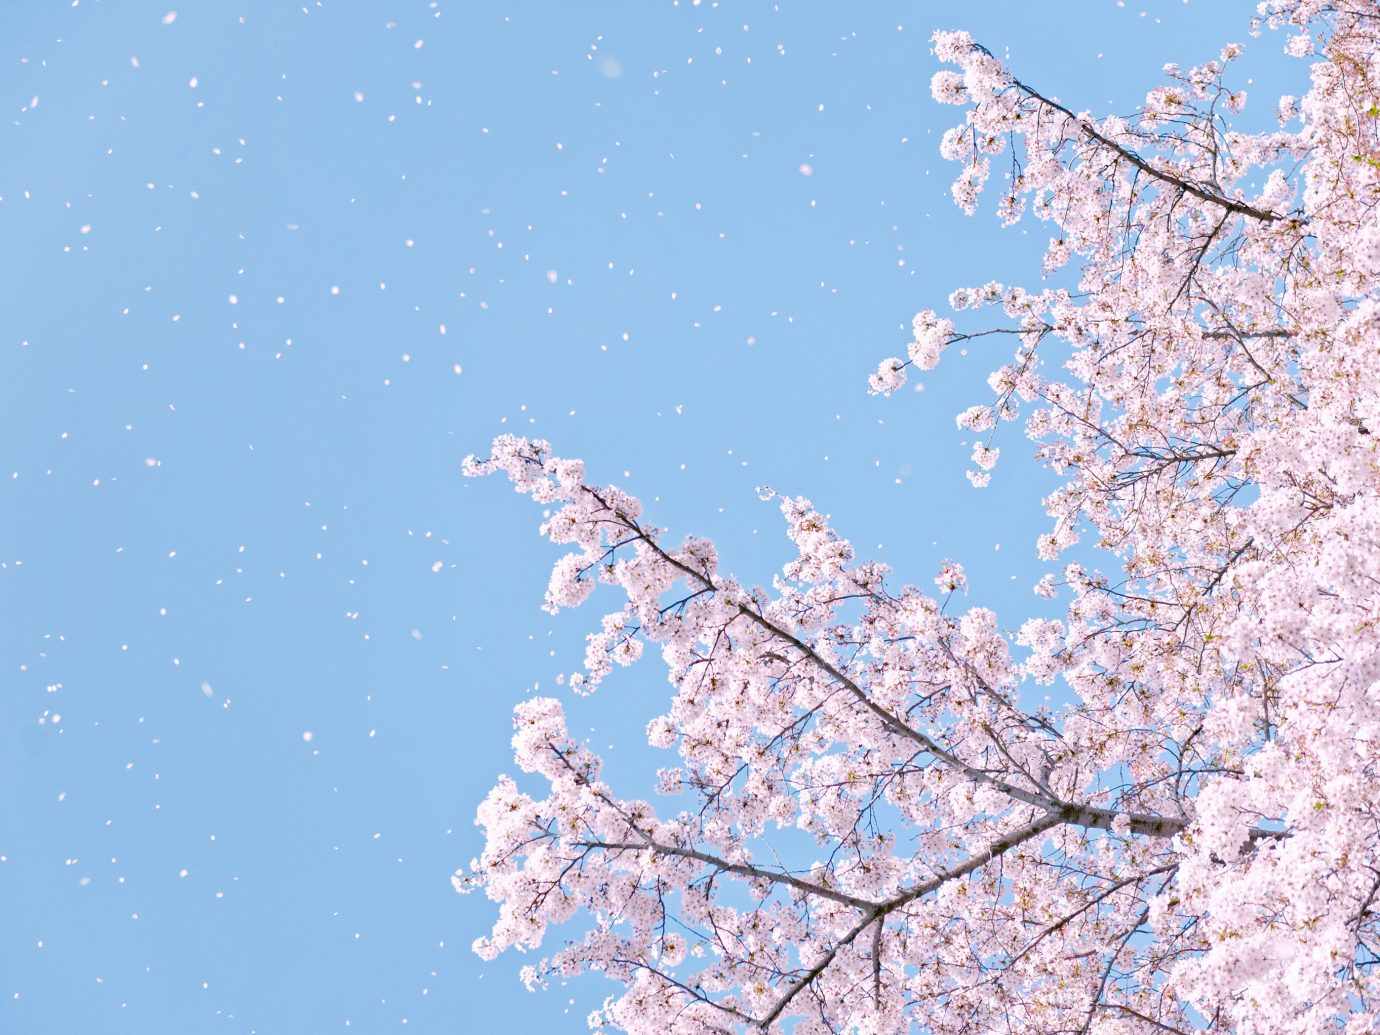 Offbeat tree sky outdoor flower branch plant blossom cherry blossom season spring